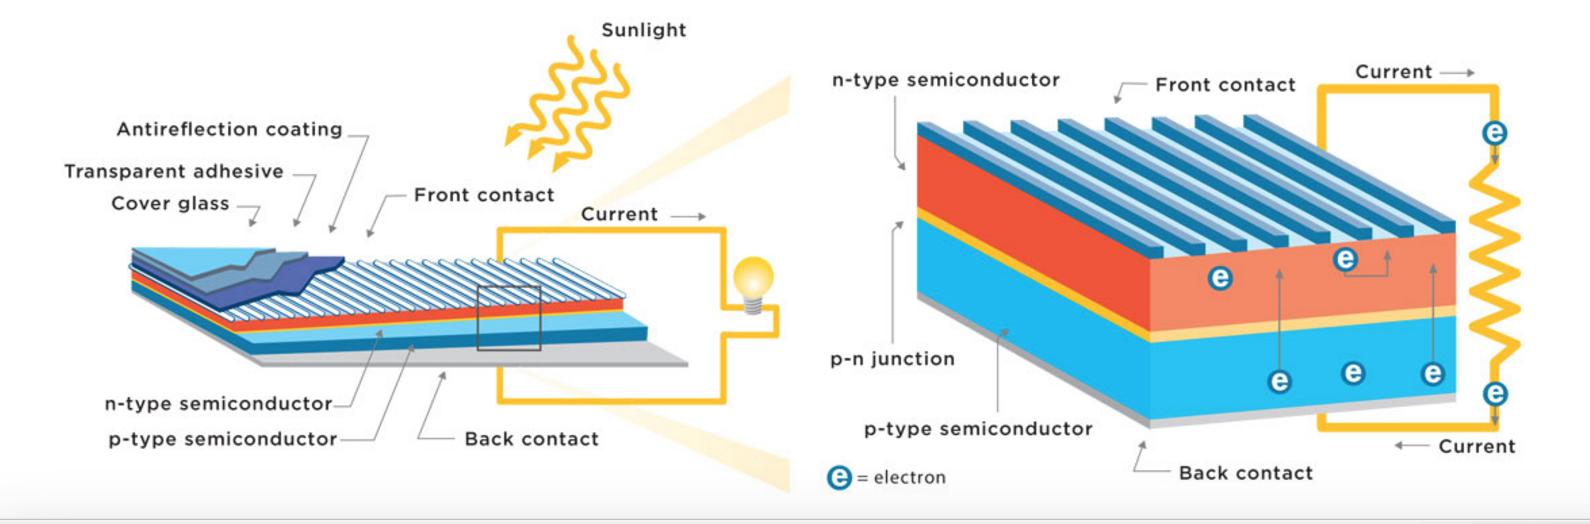 solarcellprocess.jpg